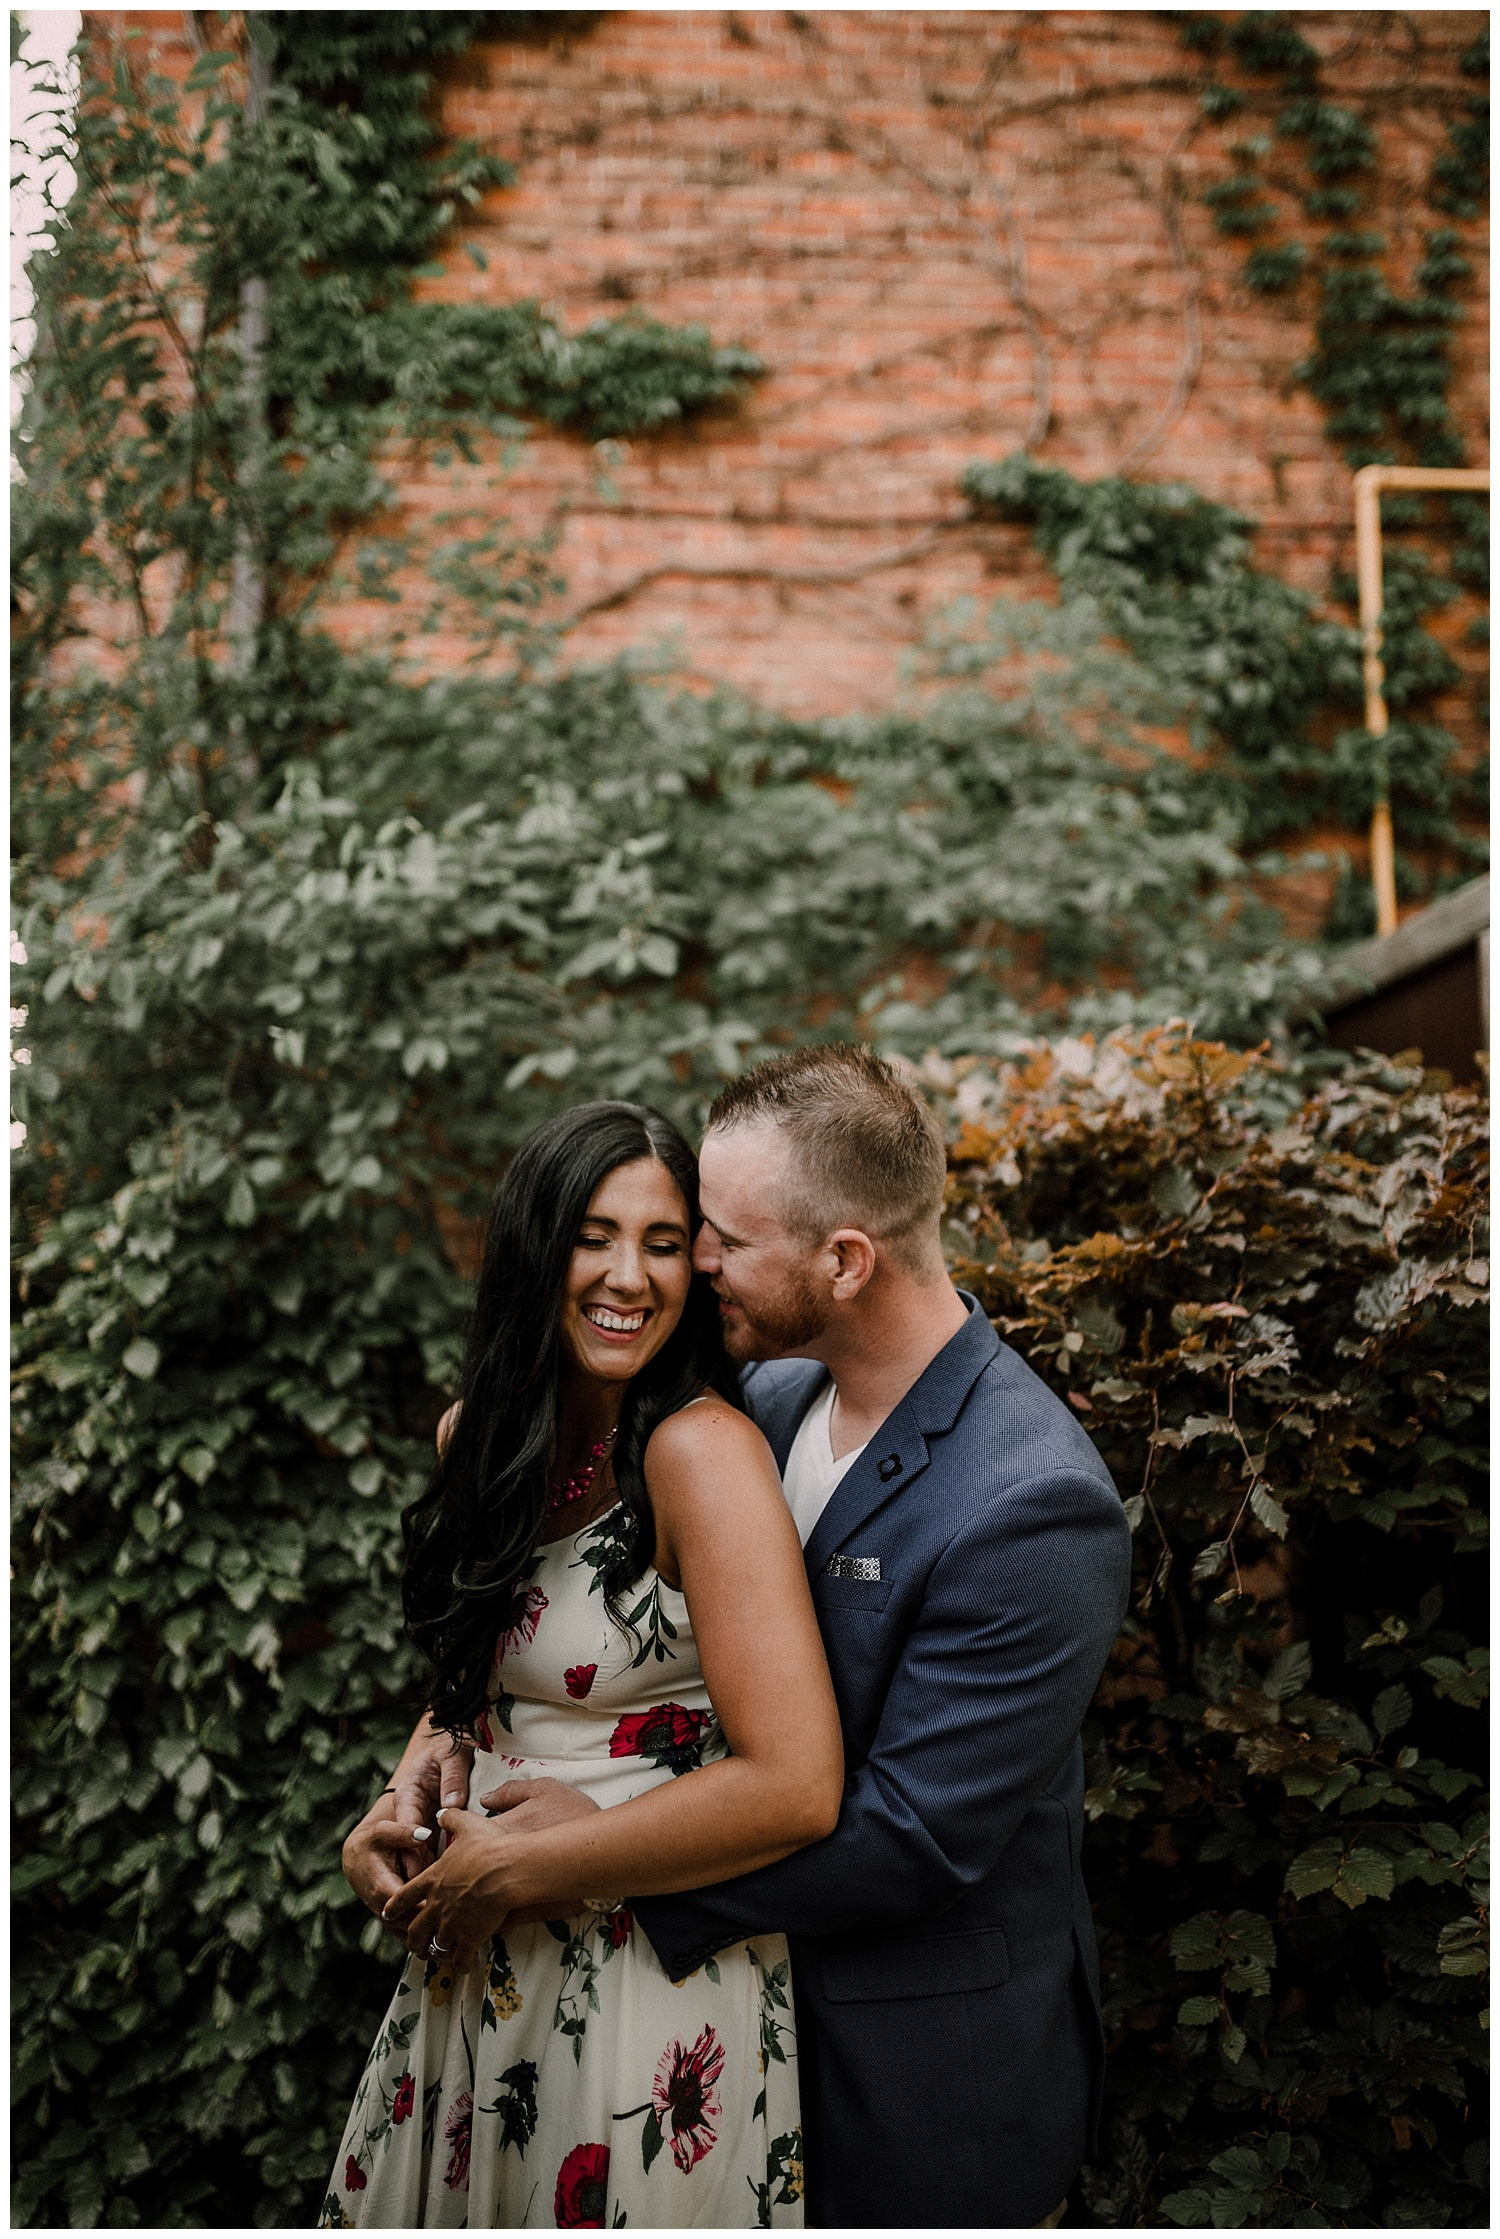 katie marie photography - dundas hamilton waterfall engagement photoshoot - wedding photographer_0041.jpg